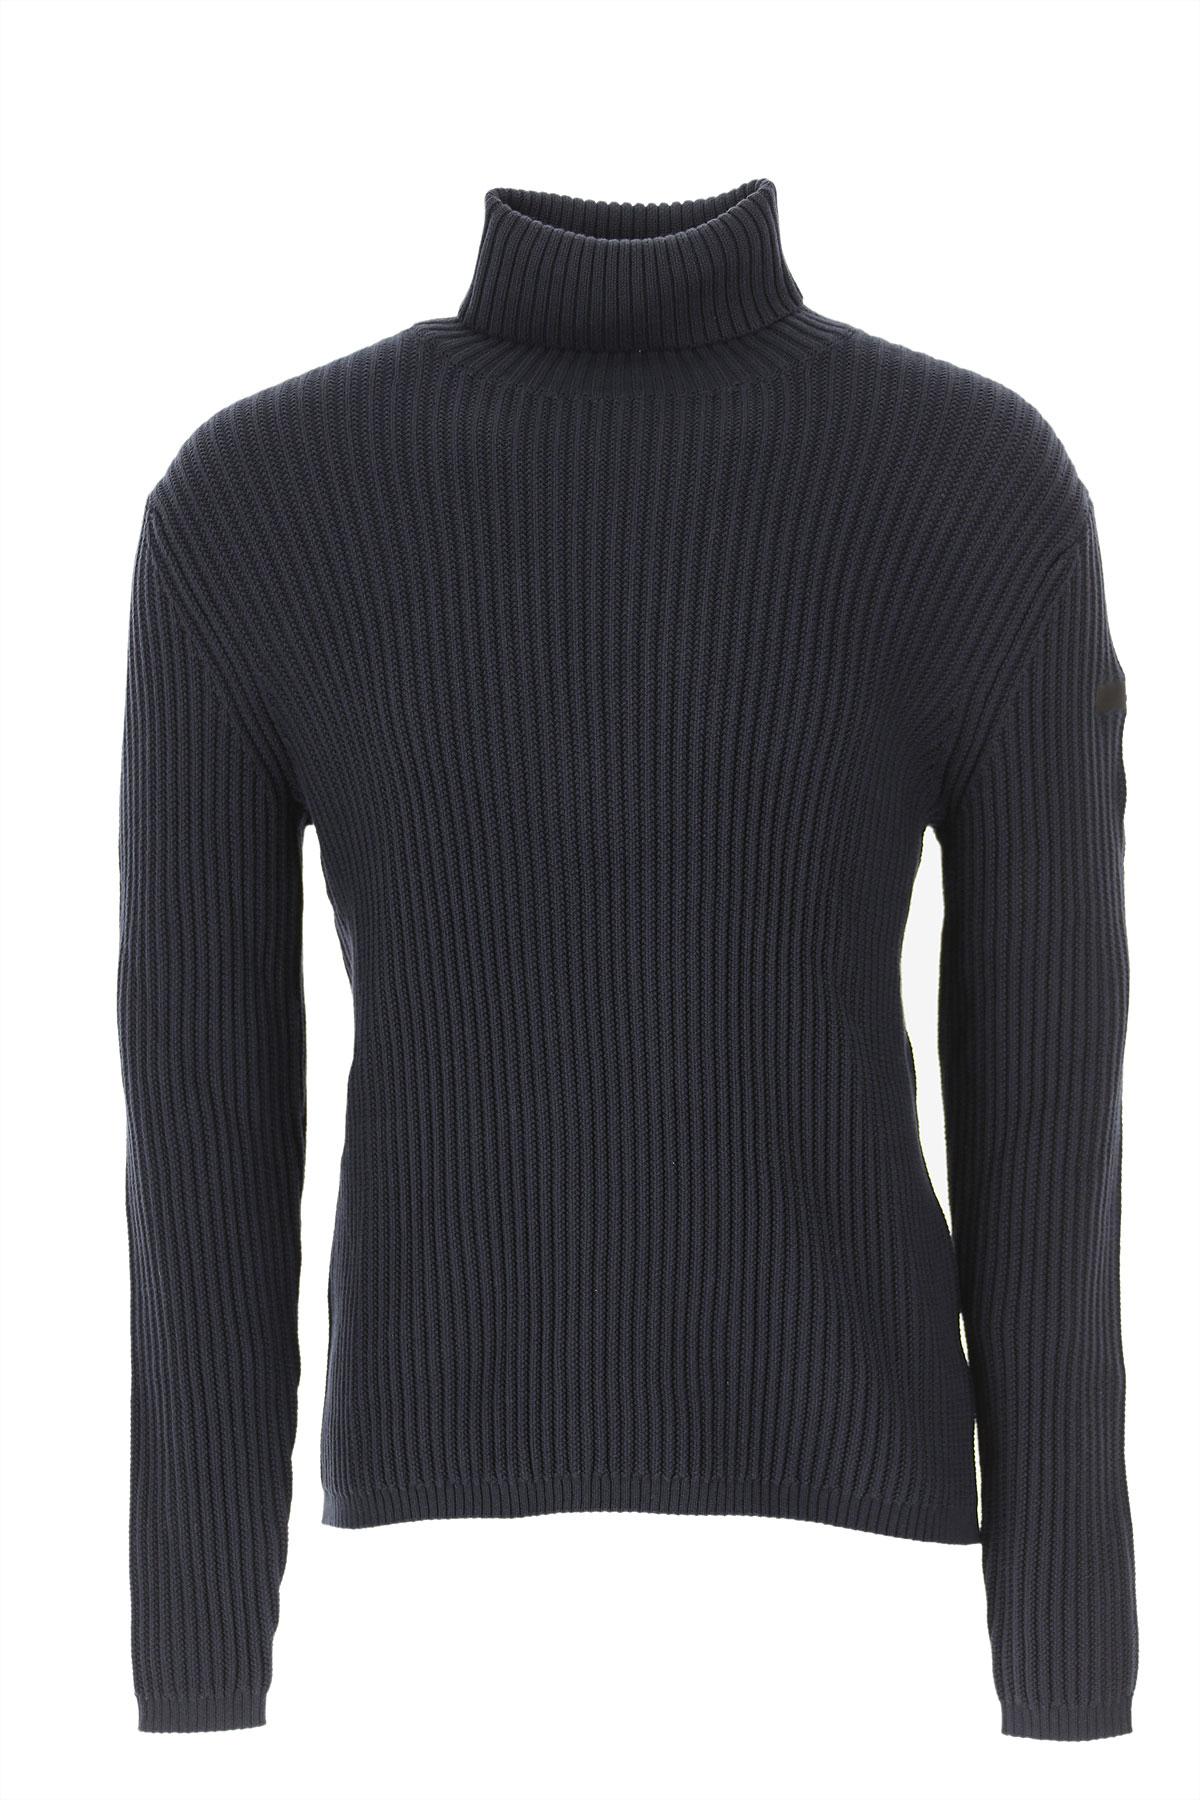 RRD Sweater for Men Jumper On Sale, Midnight Blue, Cotton, 2019, L M